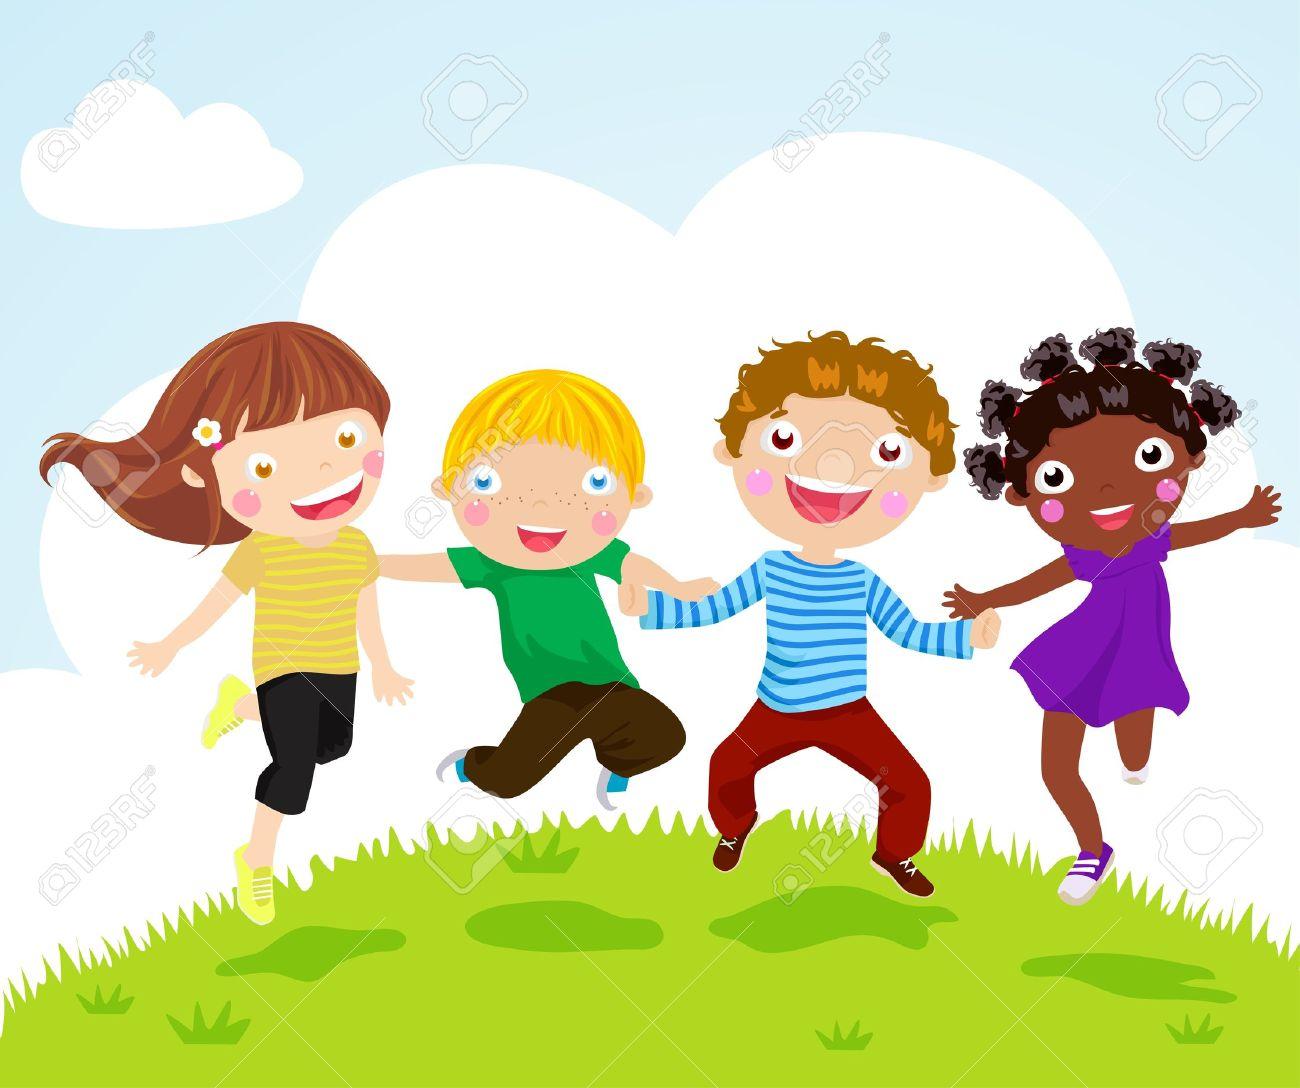 Happy jumping kids - 15301256